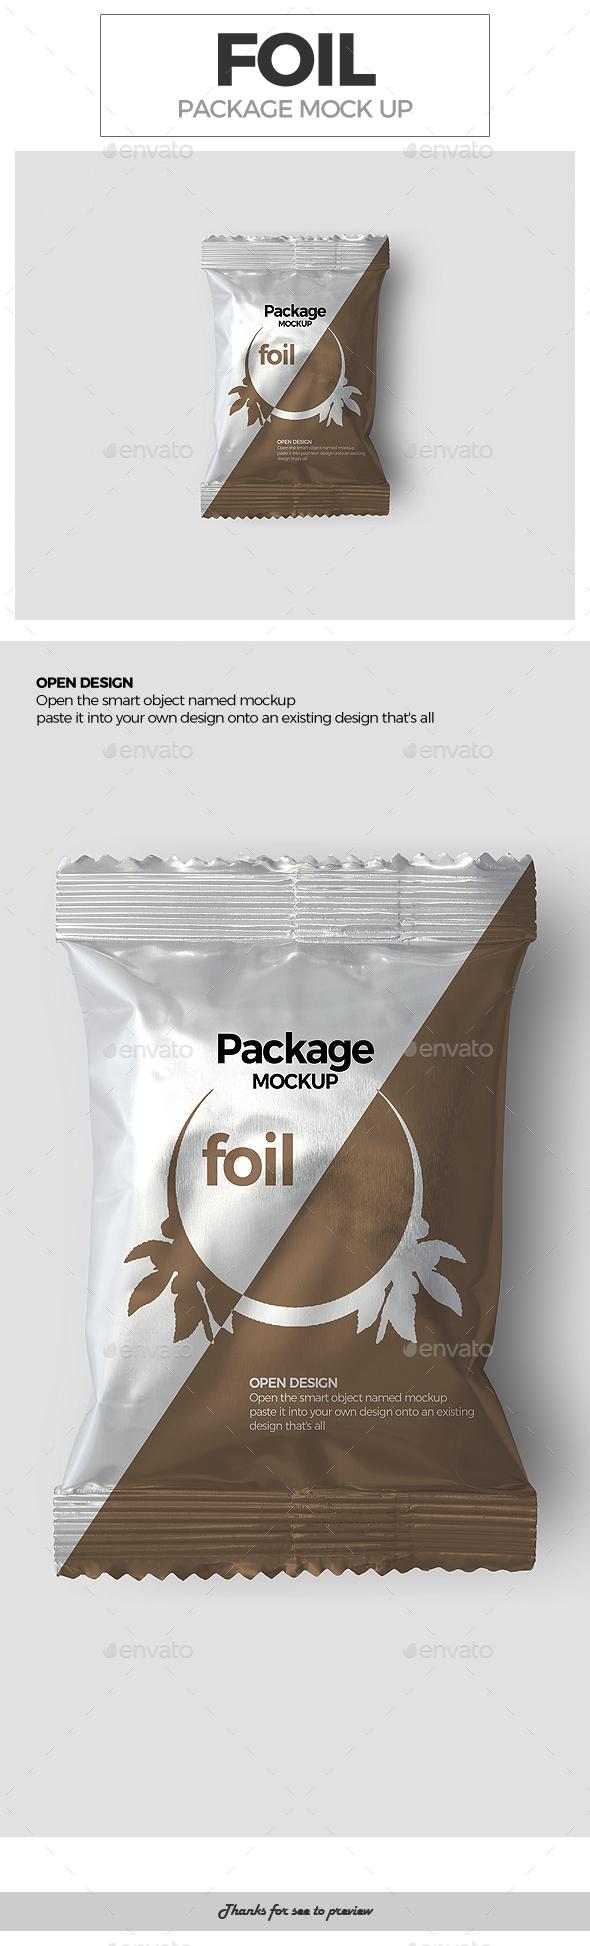 Foil Package Mockup - Packaging Product Mock-Ups